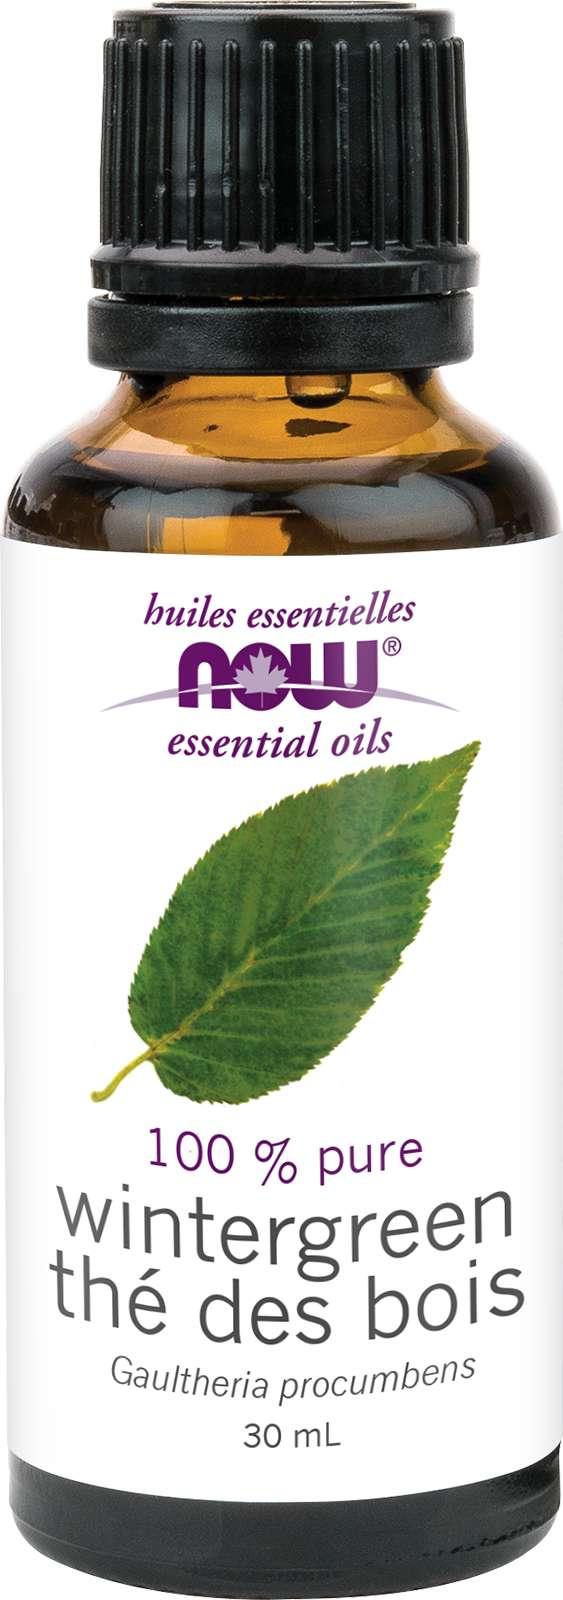 Wintergreen Oil (Gaultheria procumbens) 30mL